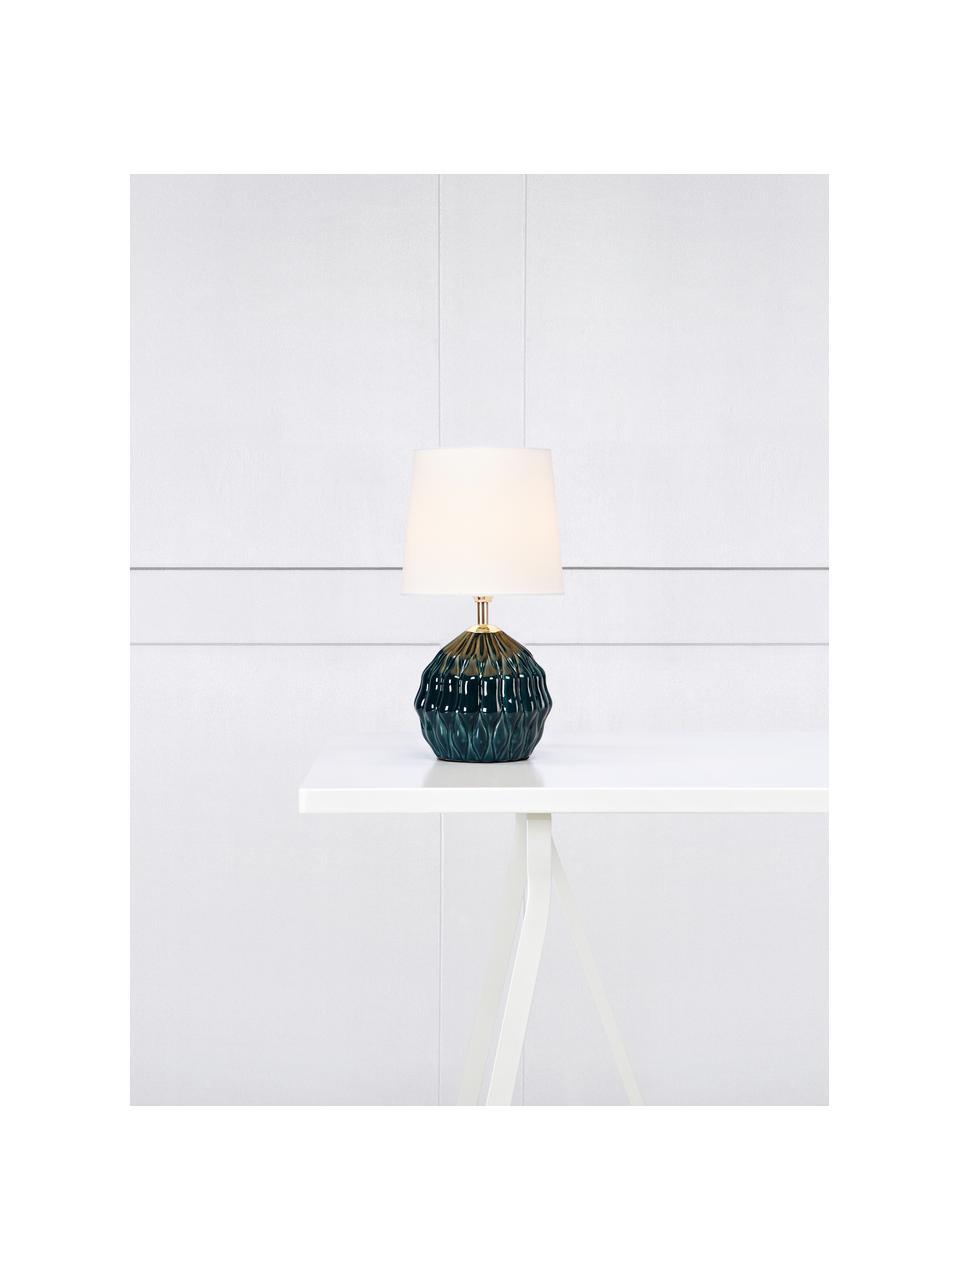 Keramik-Tischlampe Lora in Dunkelgrün, Lampenschirm: Textil, Lampenfuß: Keramik, beschichtet, Dekor: Metall, Grün, Weiß, Ø 19 x H 35 cm